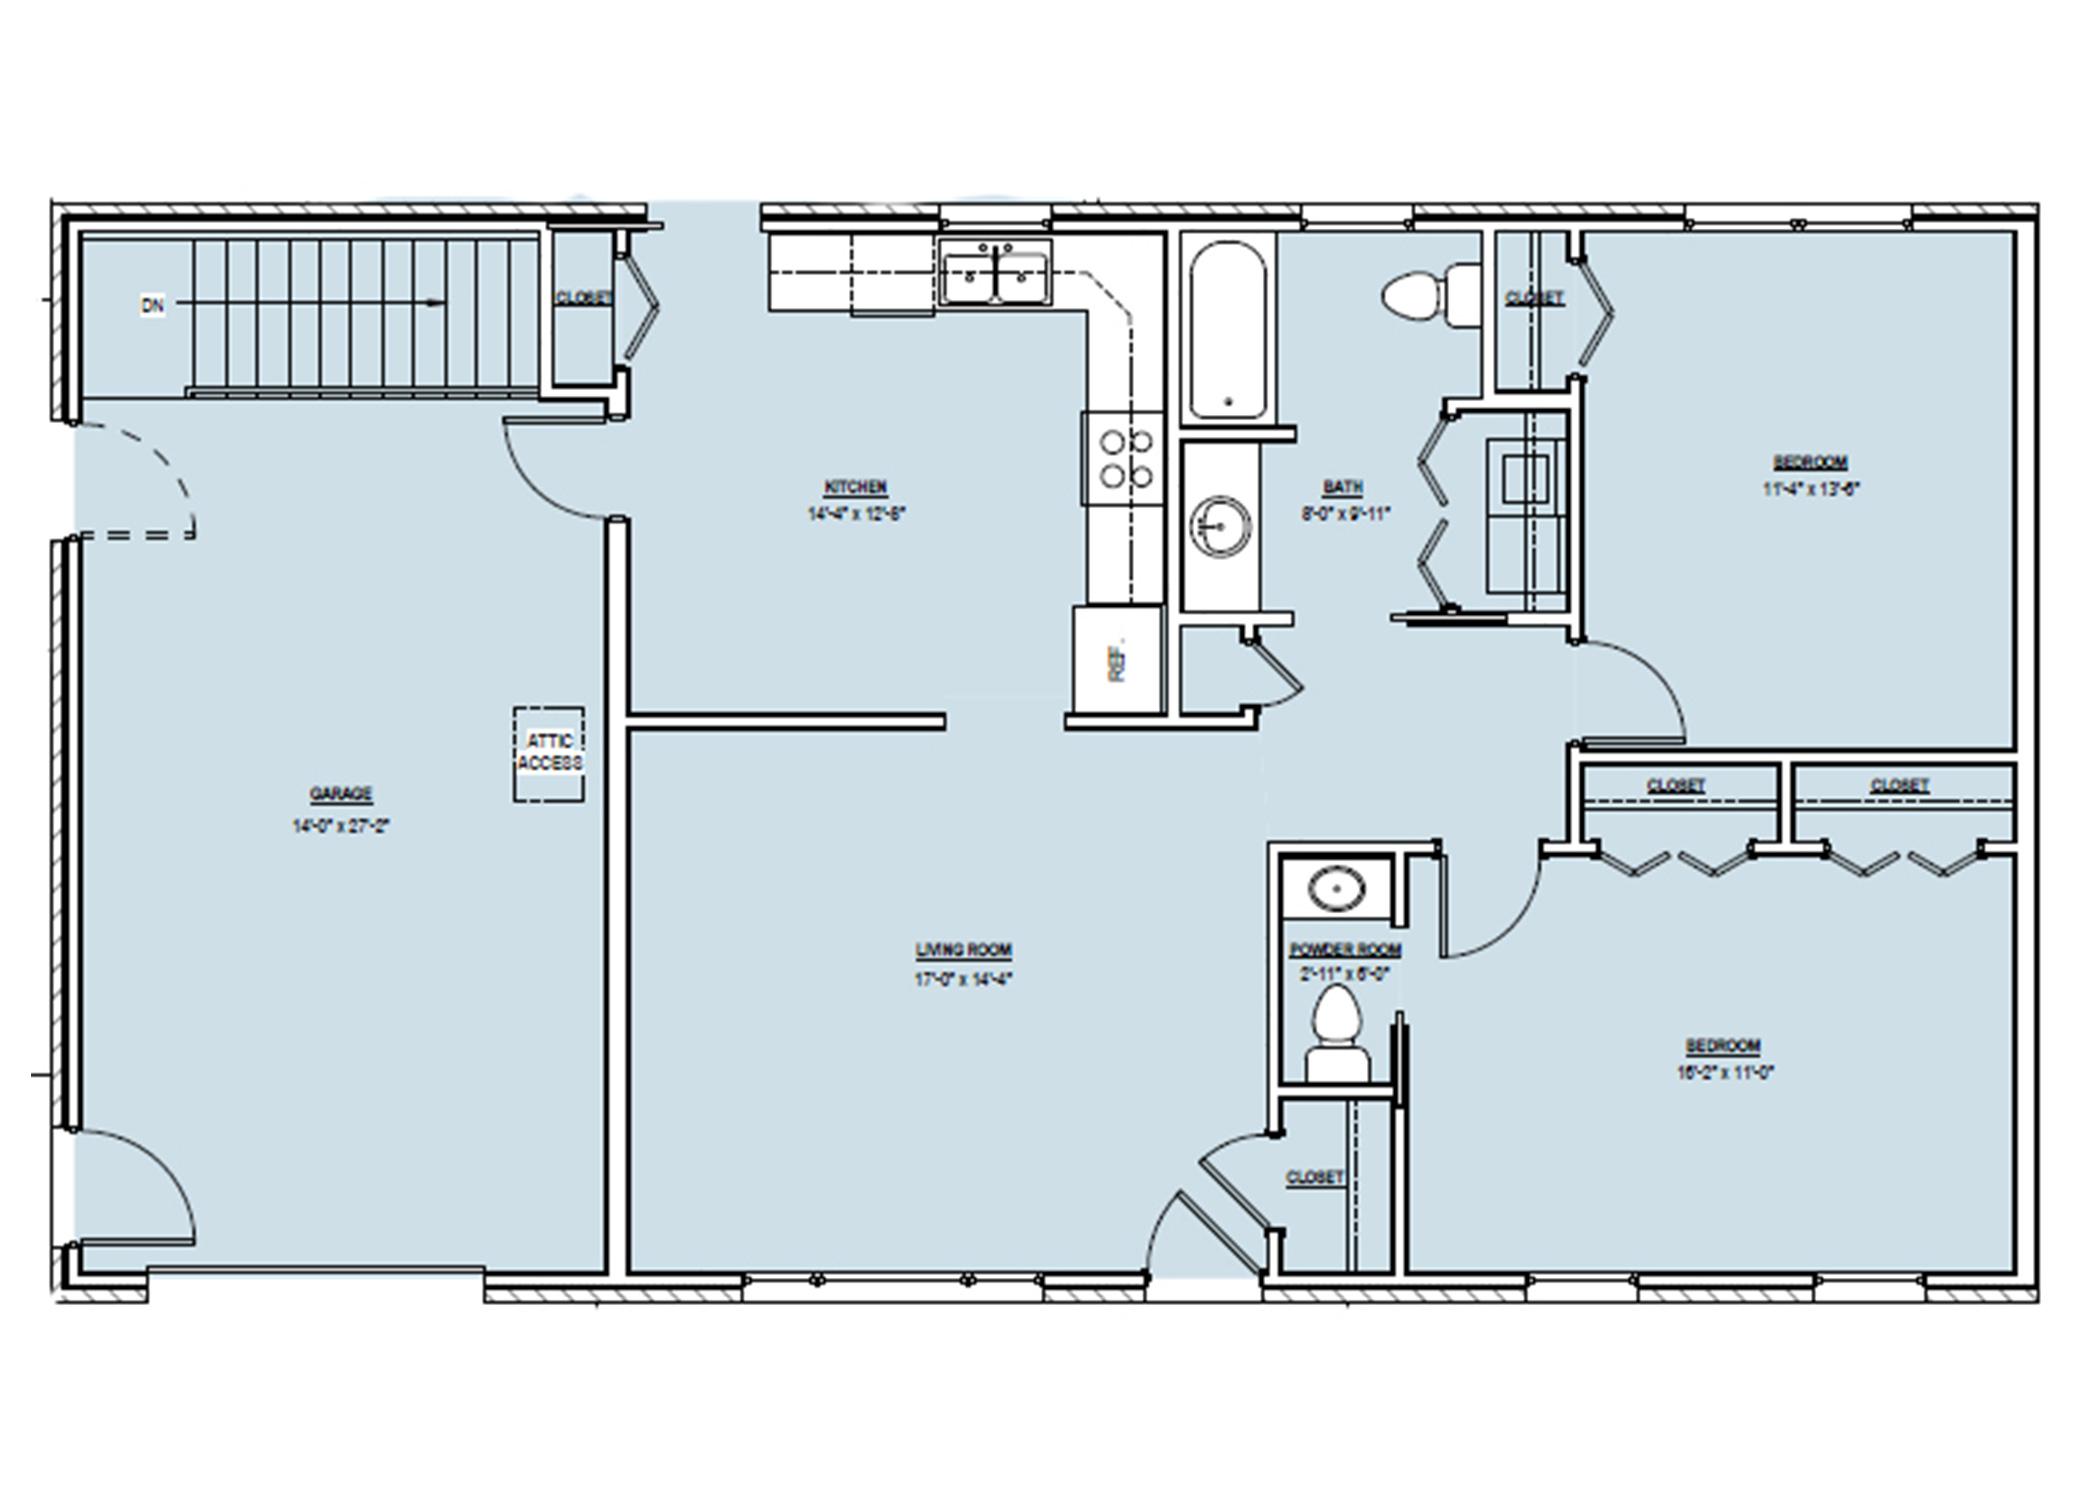 hamlin-floorplan-with-fl-without-room